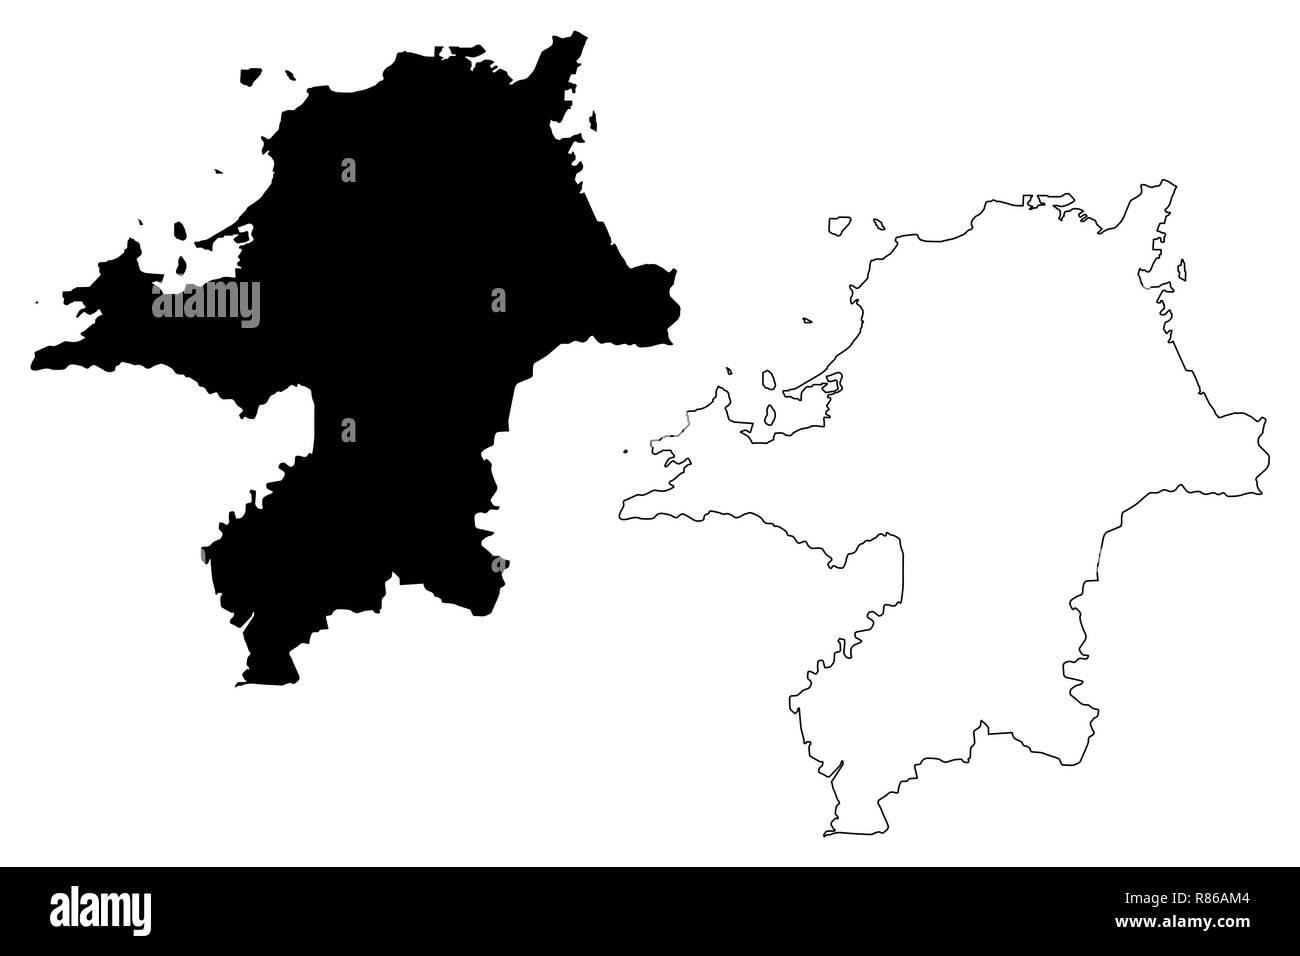 Picture of: Fukuoka Prefecture Administrative Divisions Of Japan Prefectures Of Japan Map Vector Illustration Scribble Sketch Fukuoka Map Stock Vector Image Art Alamy